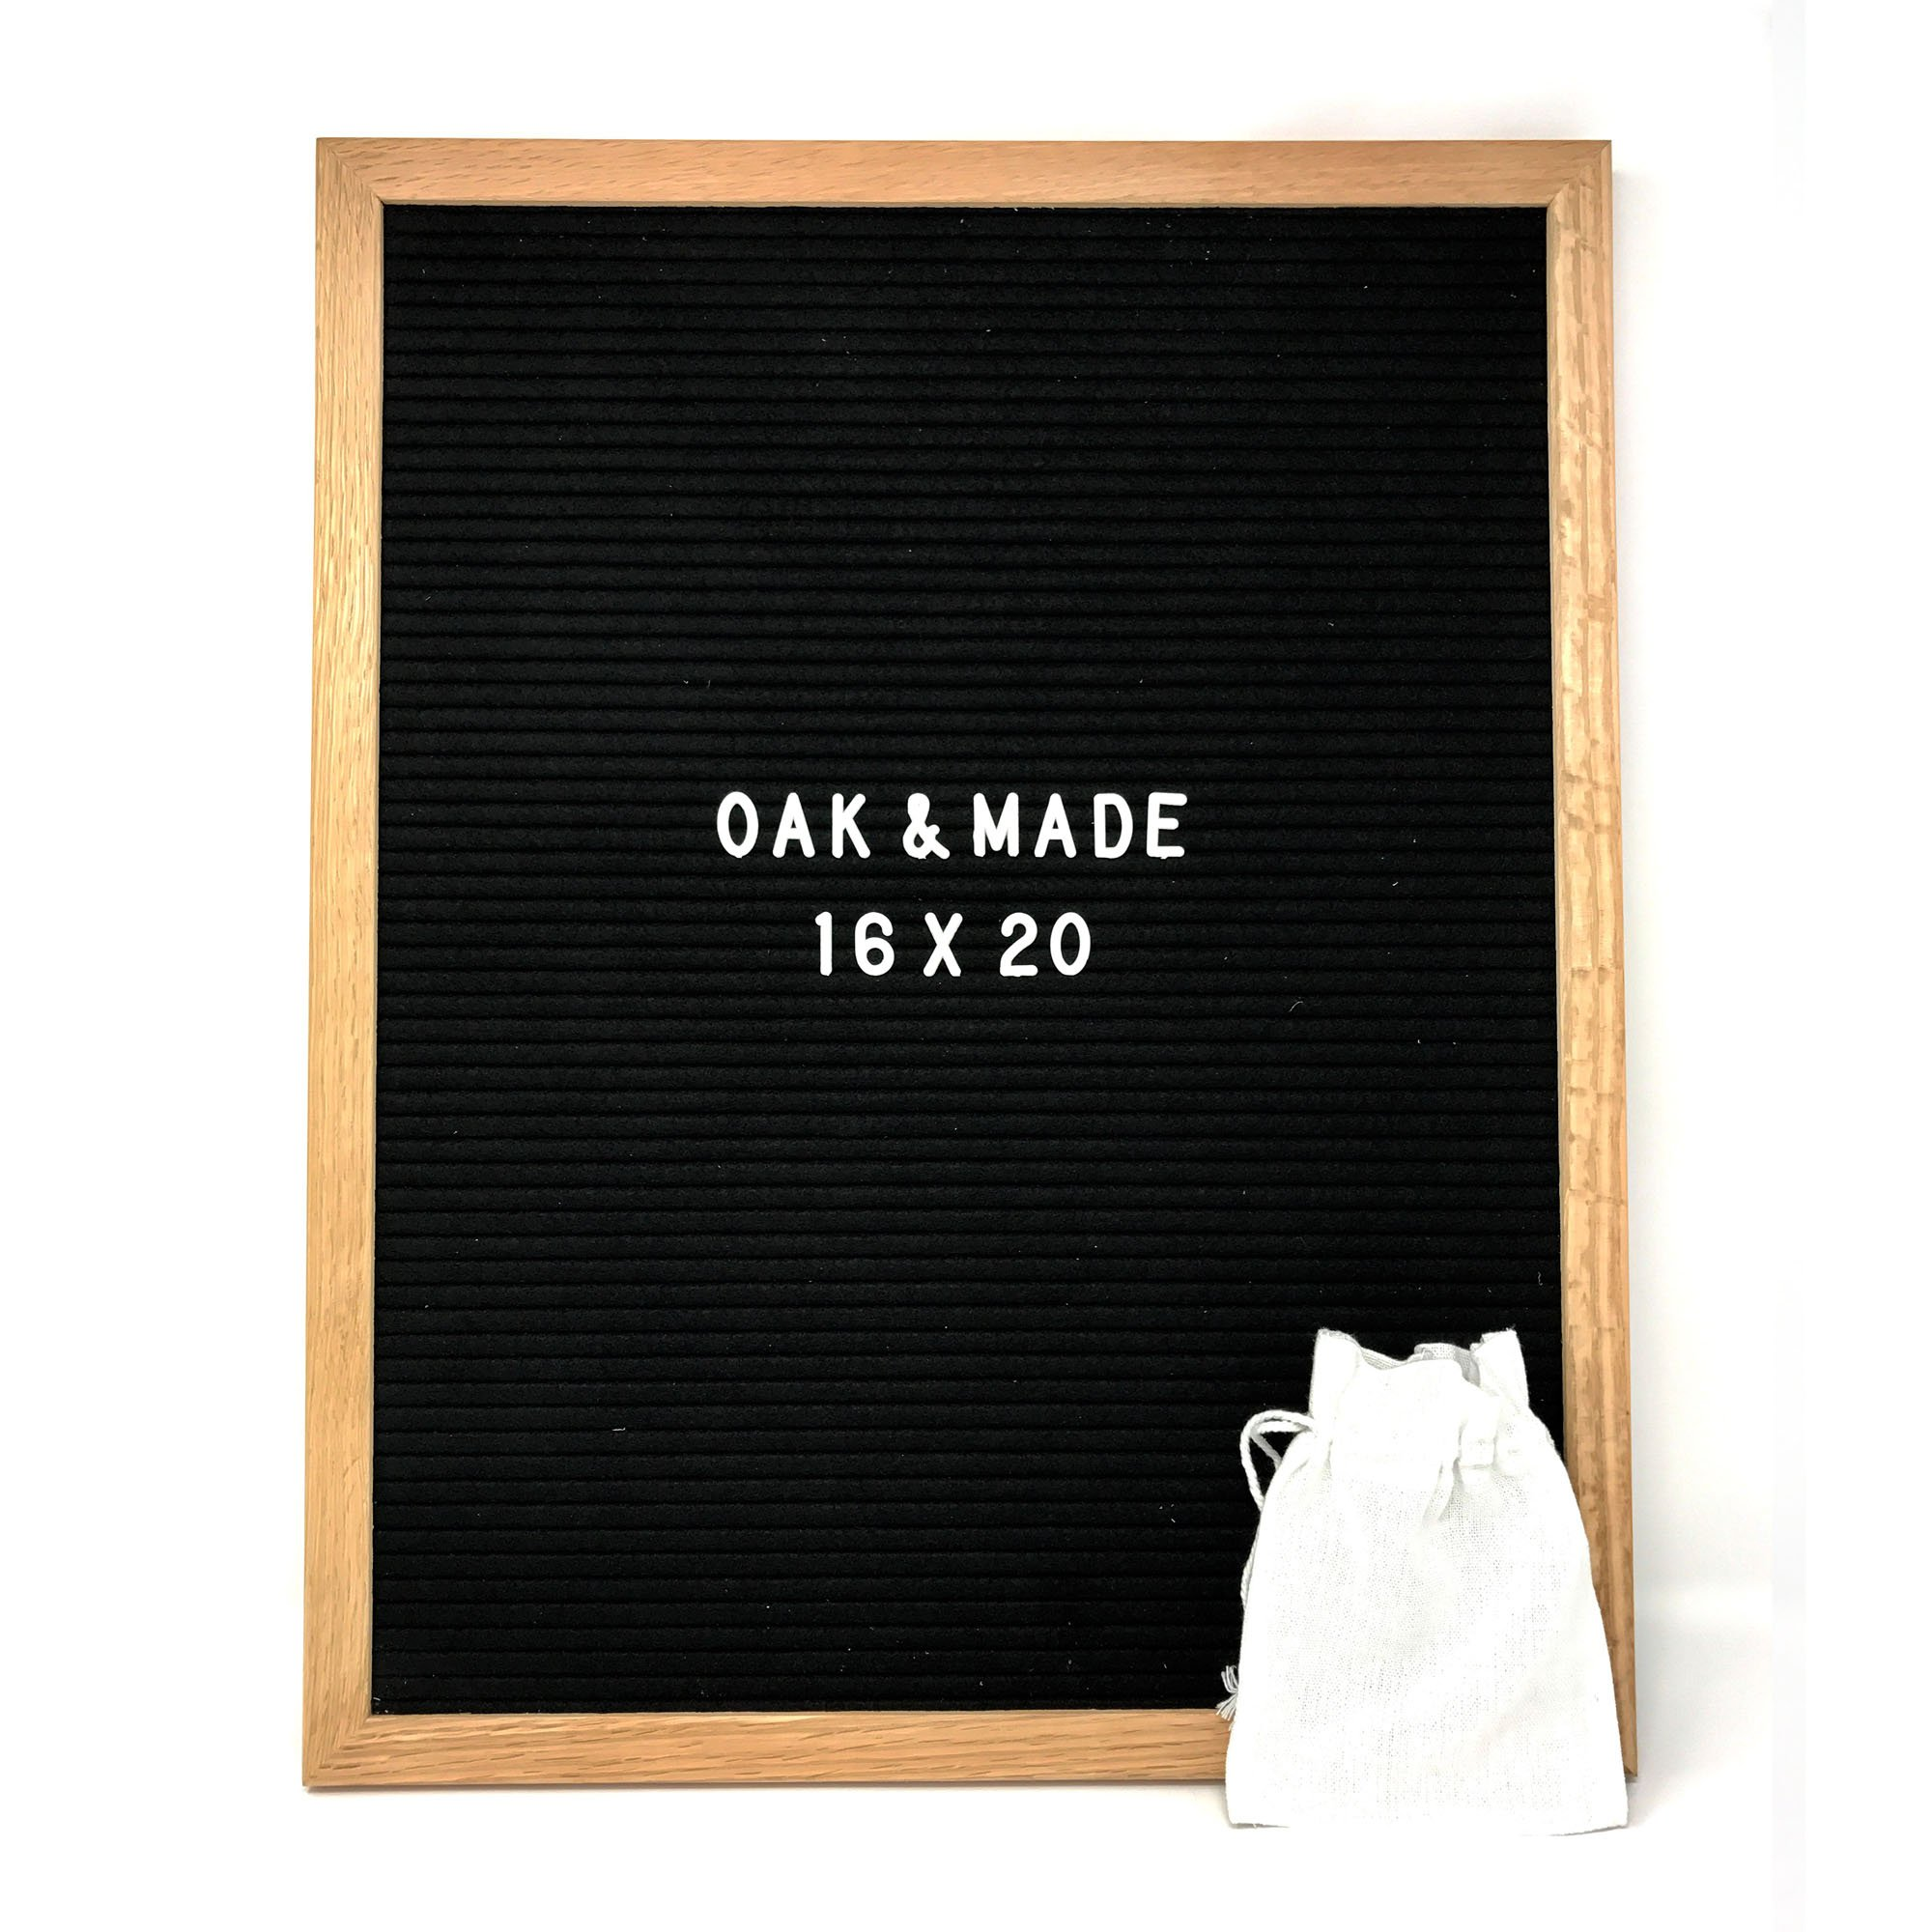 Oak & Made Letter Board, Oak Frame, Black Felt, White Letters, Large (16'' x 20'')